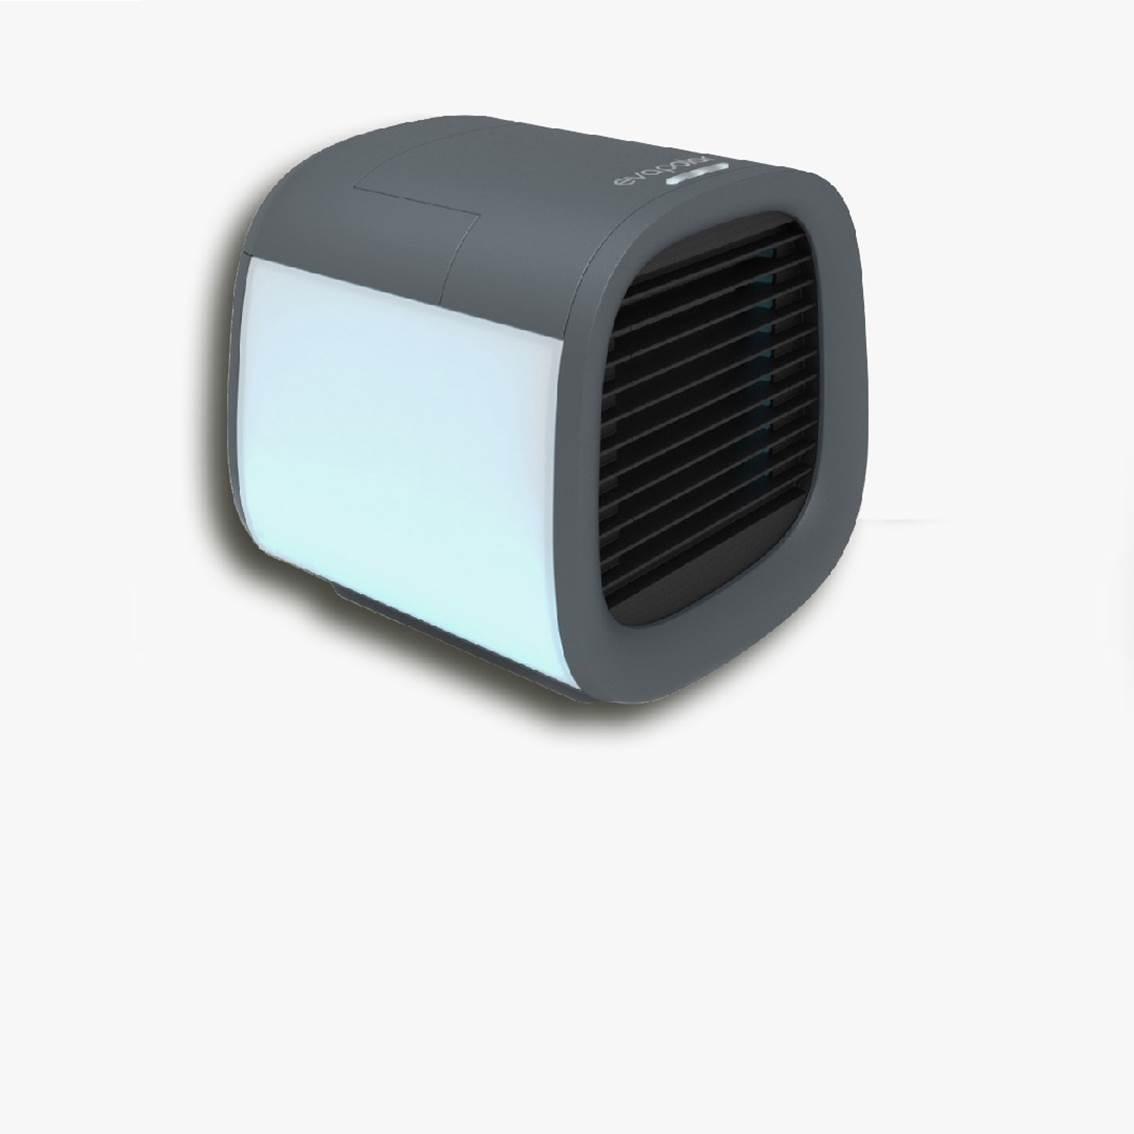 evaPOLAR手提涼風機(供應商發貨, 到貨將另行通知取貨)